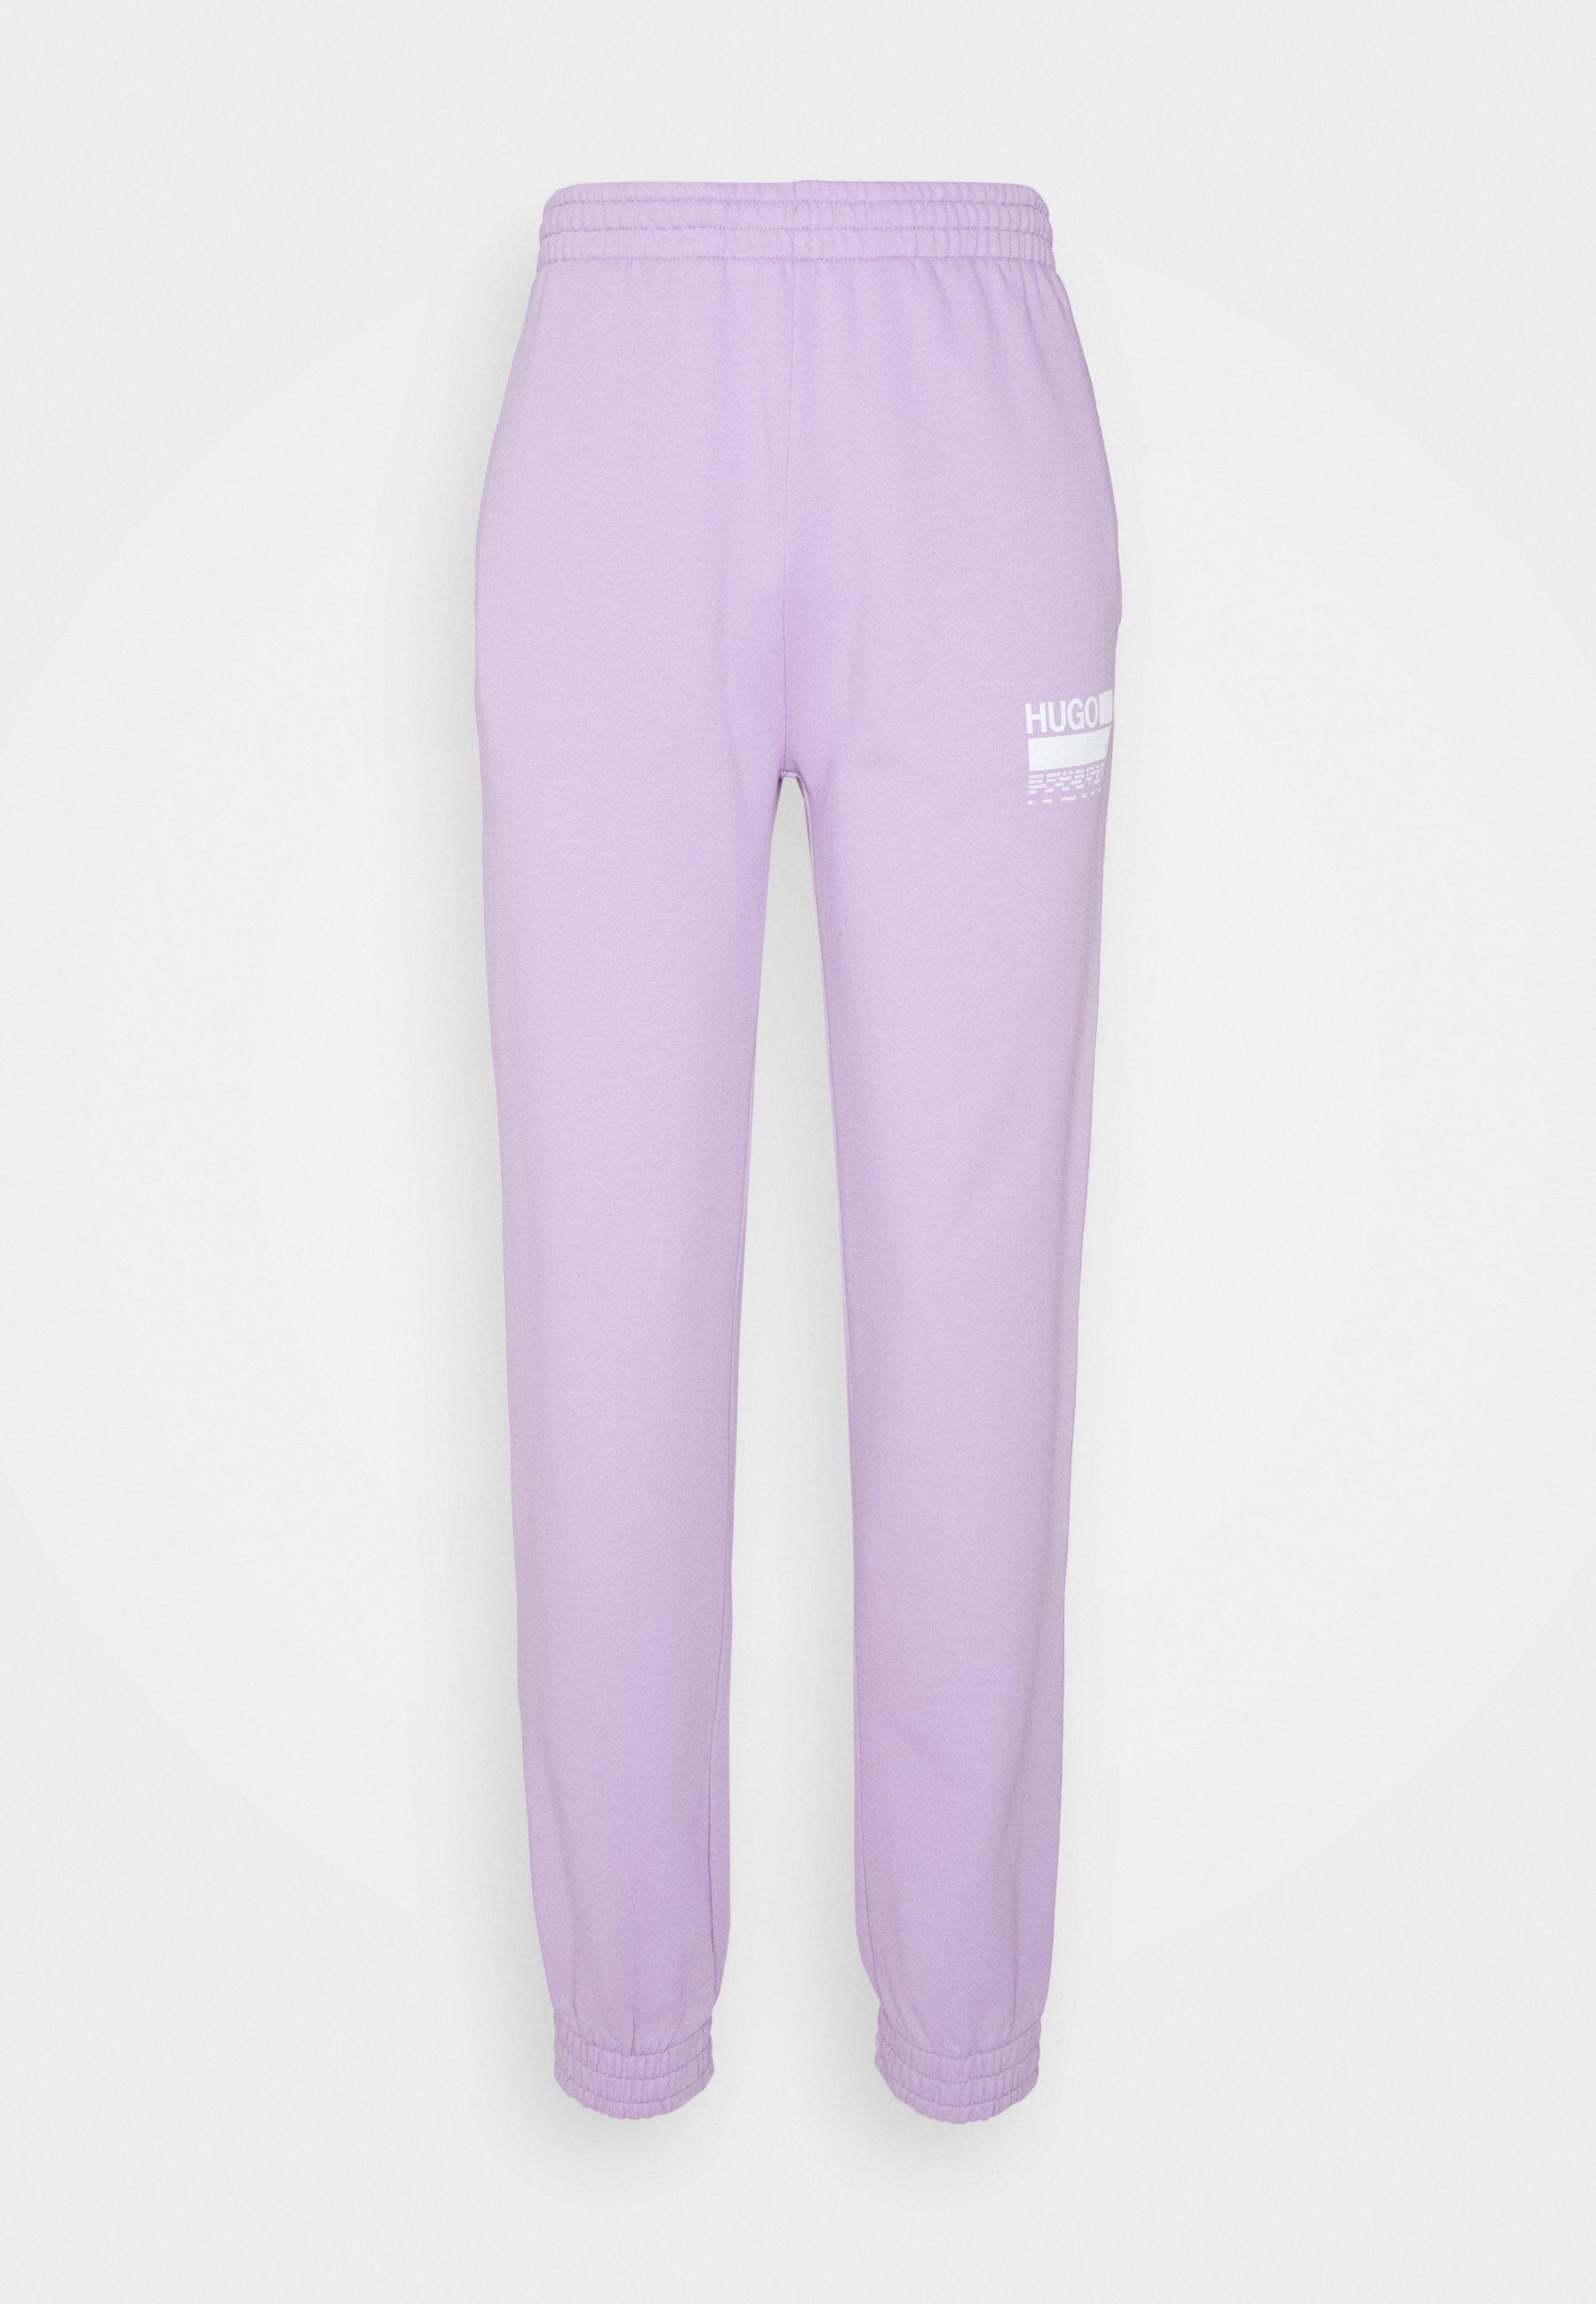 Mujer NAJOGGER - Pantalones deportivos